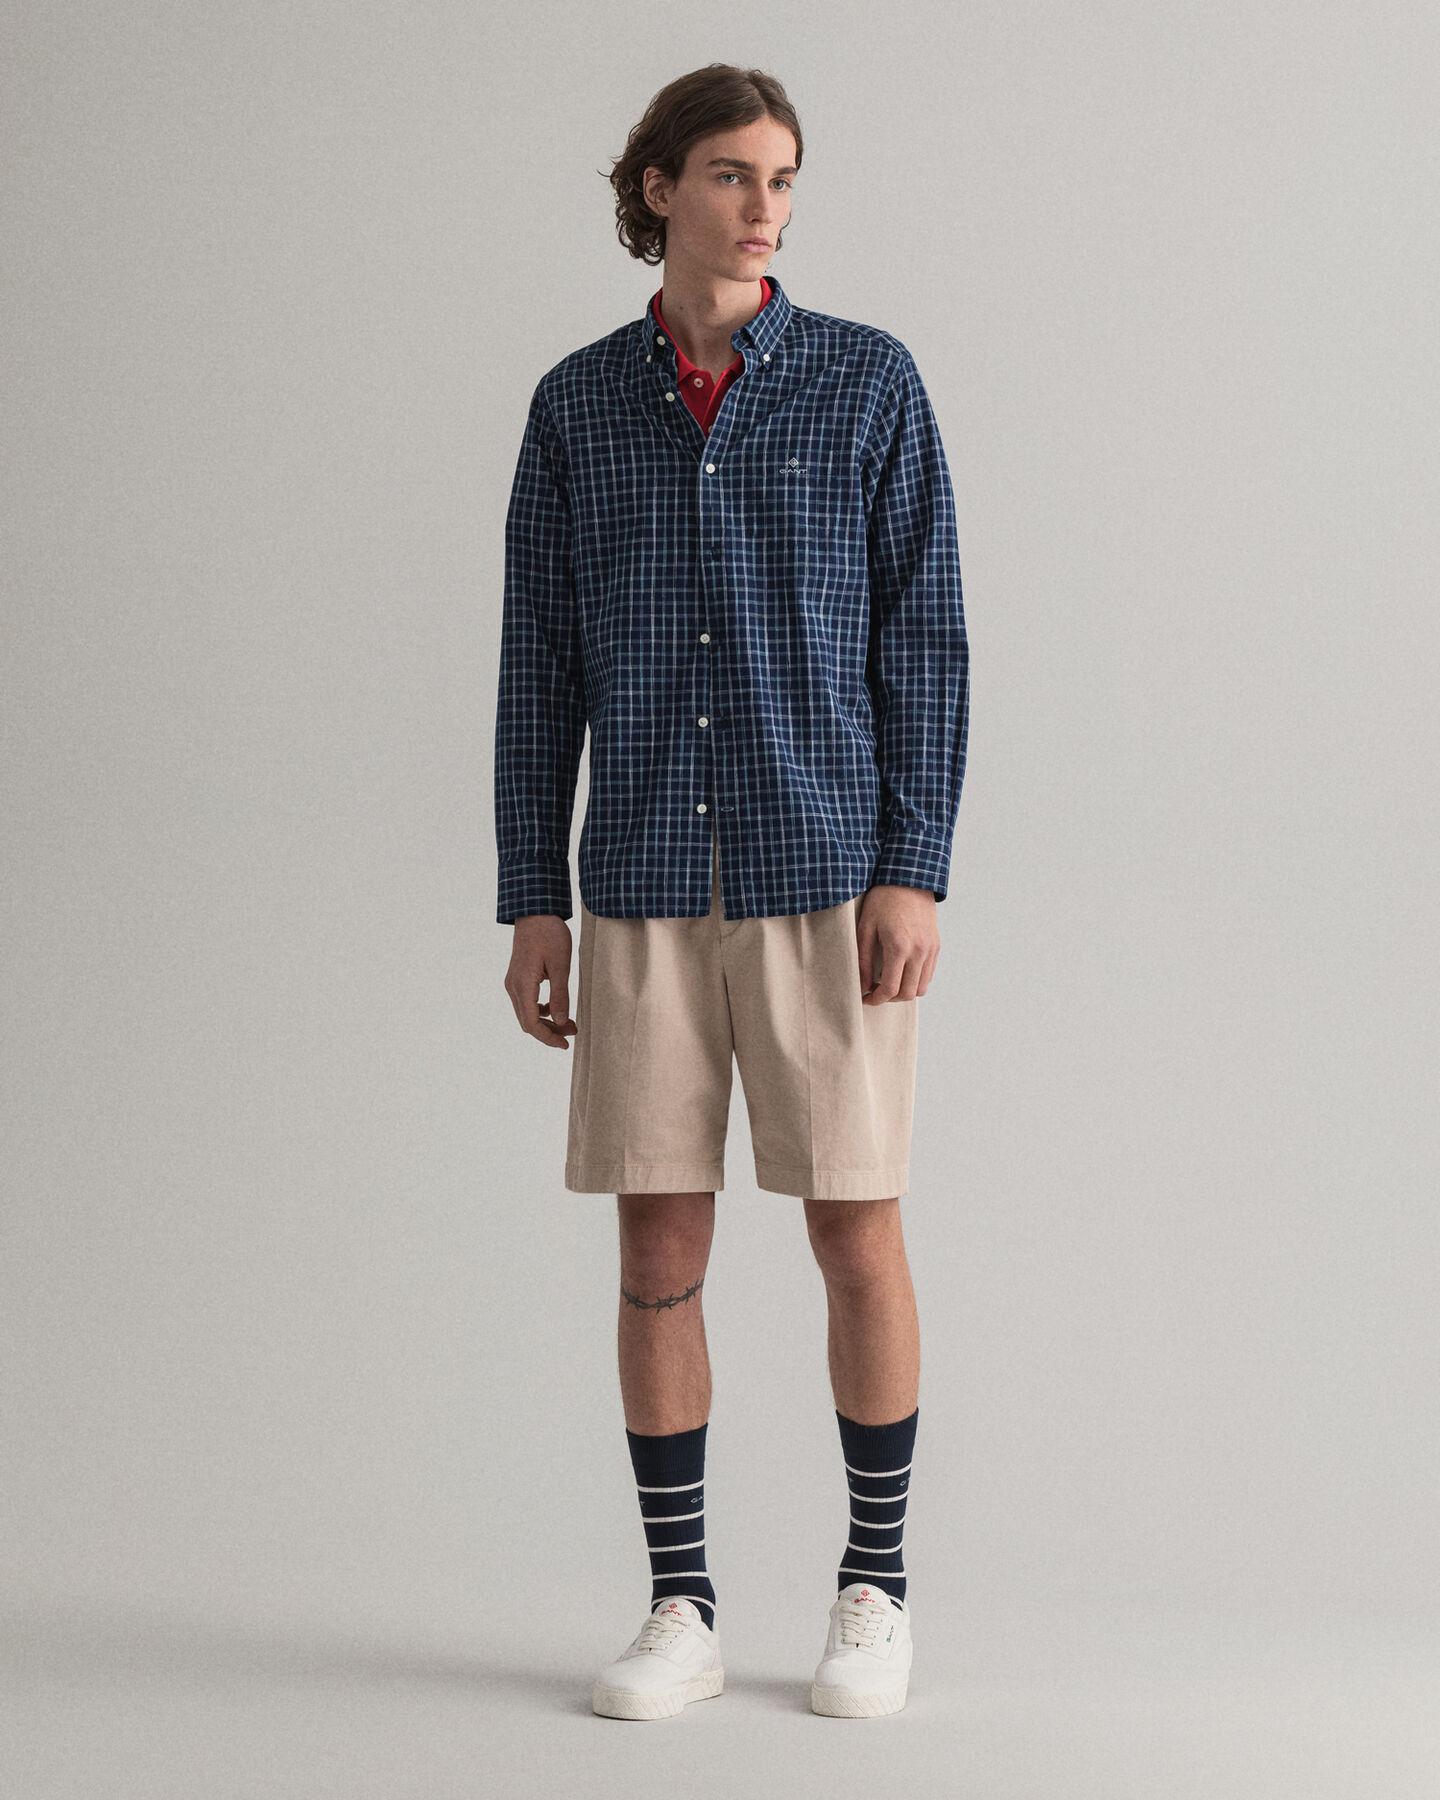 Regular Fit Indigo Space Yarns Shirt